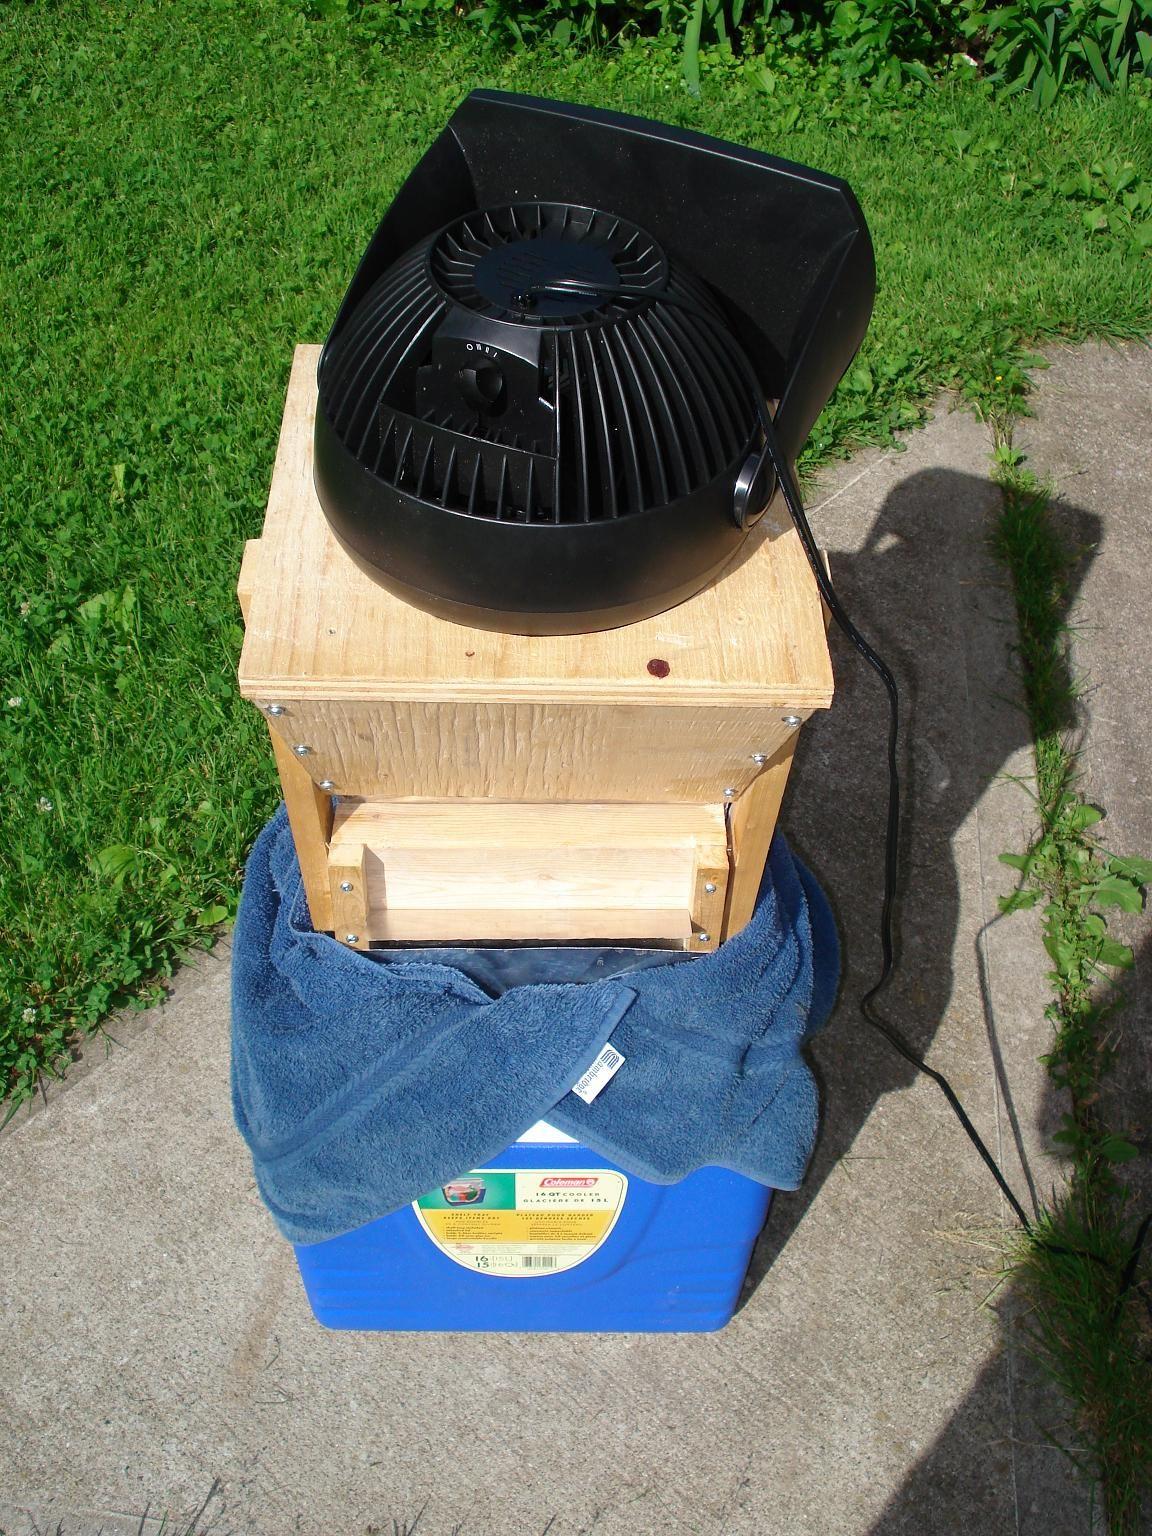 Homemade Dehumidifier http://www.ehow.com/how_5317871_make-own-